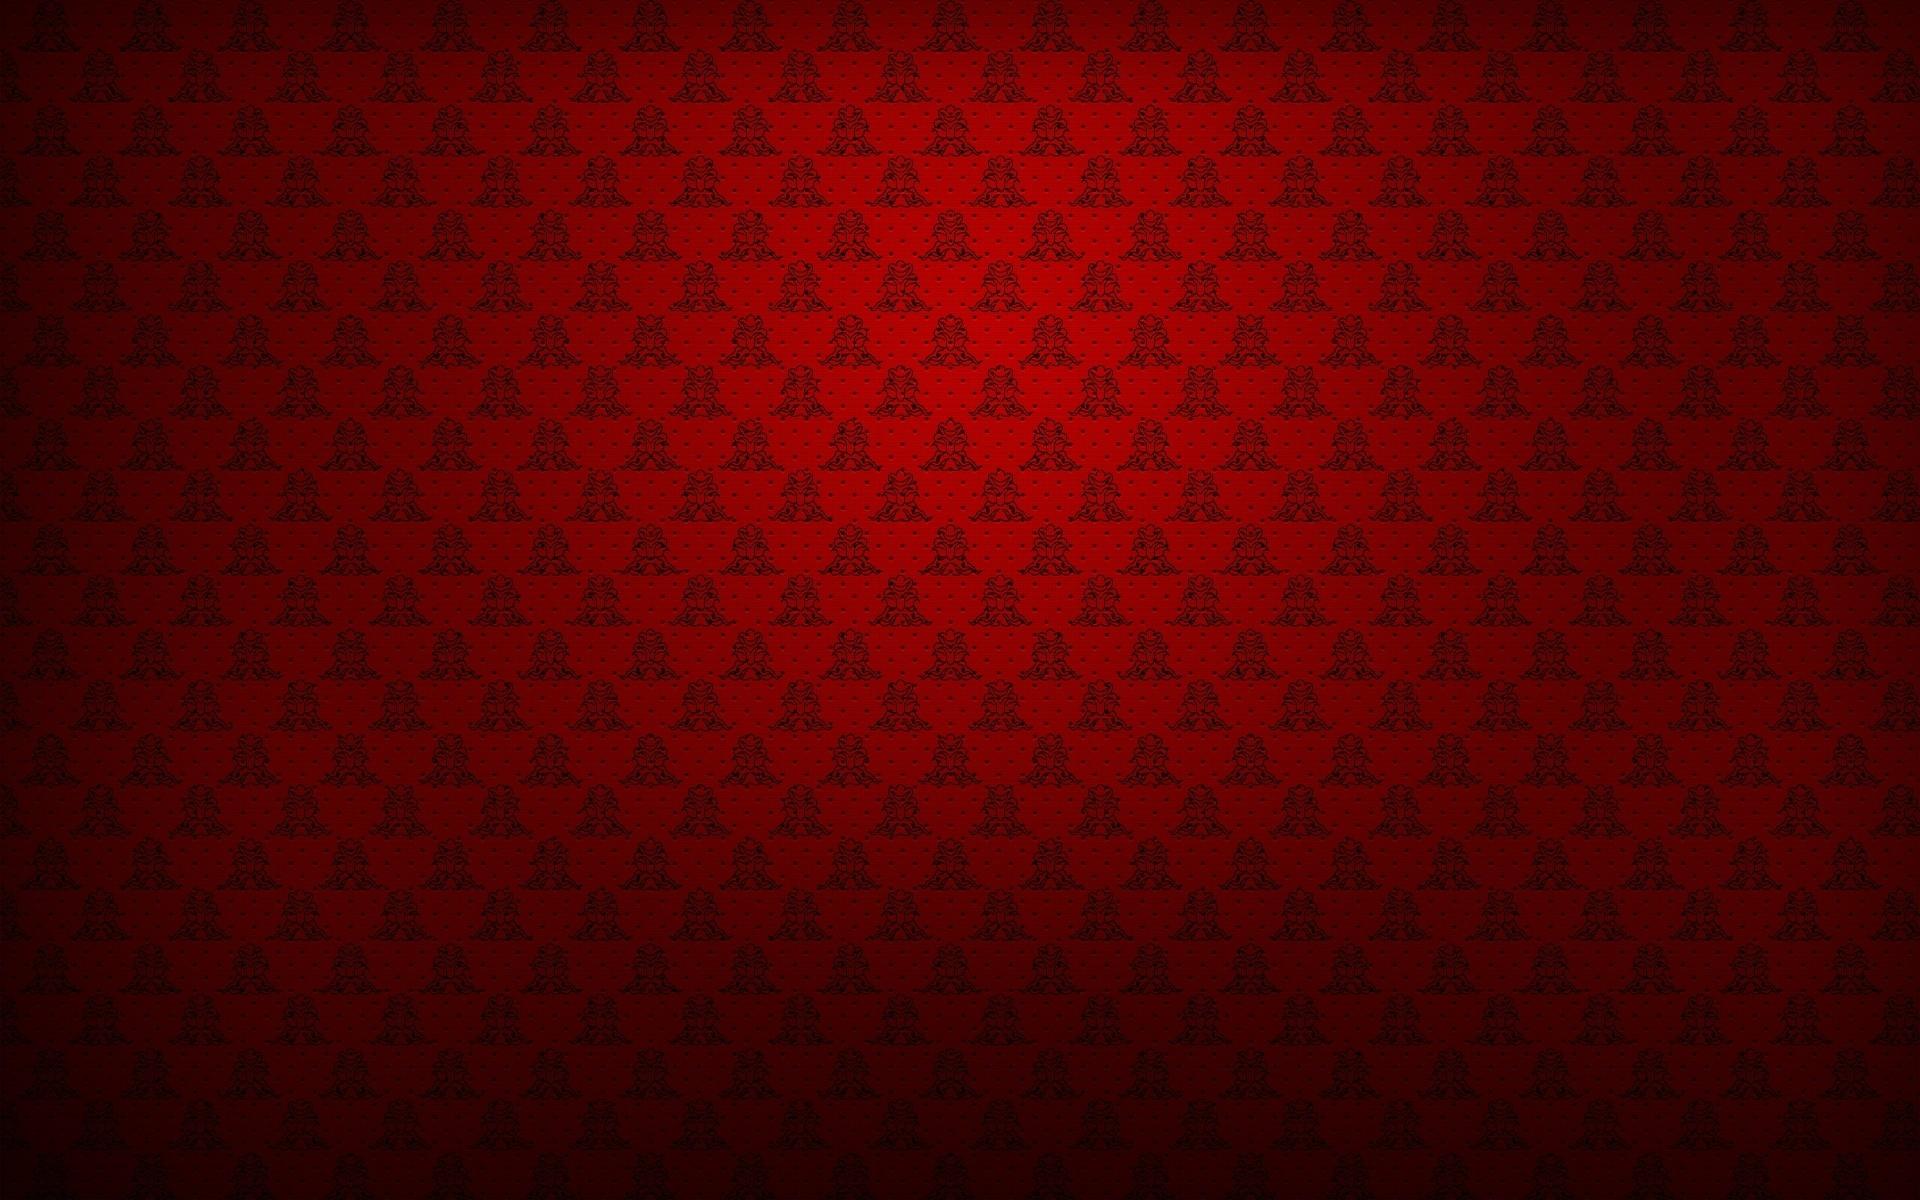 Best-new-background-patterns-Red-Patterns-1920-Red-Patterns-Background-Imageif-thr-wallpaper-wp3403186